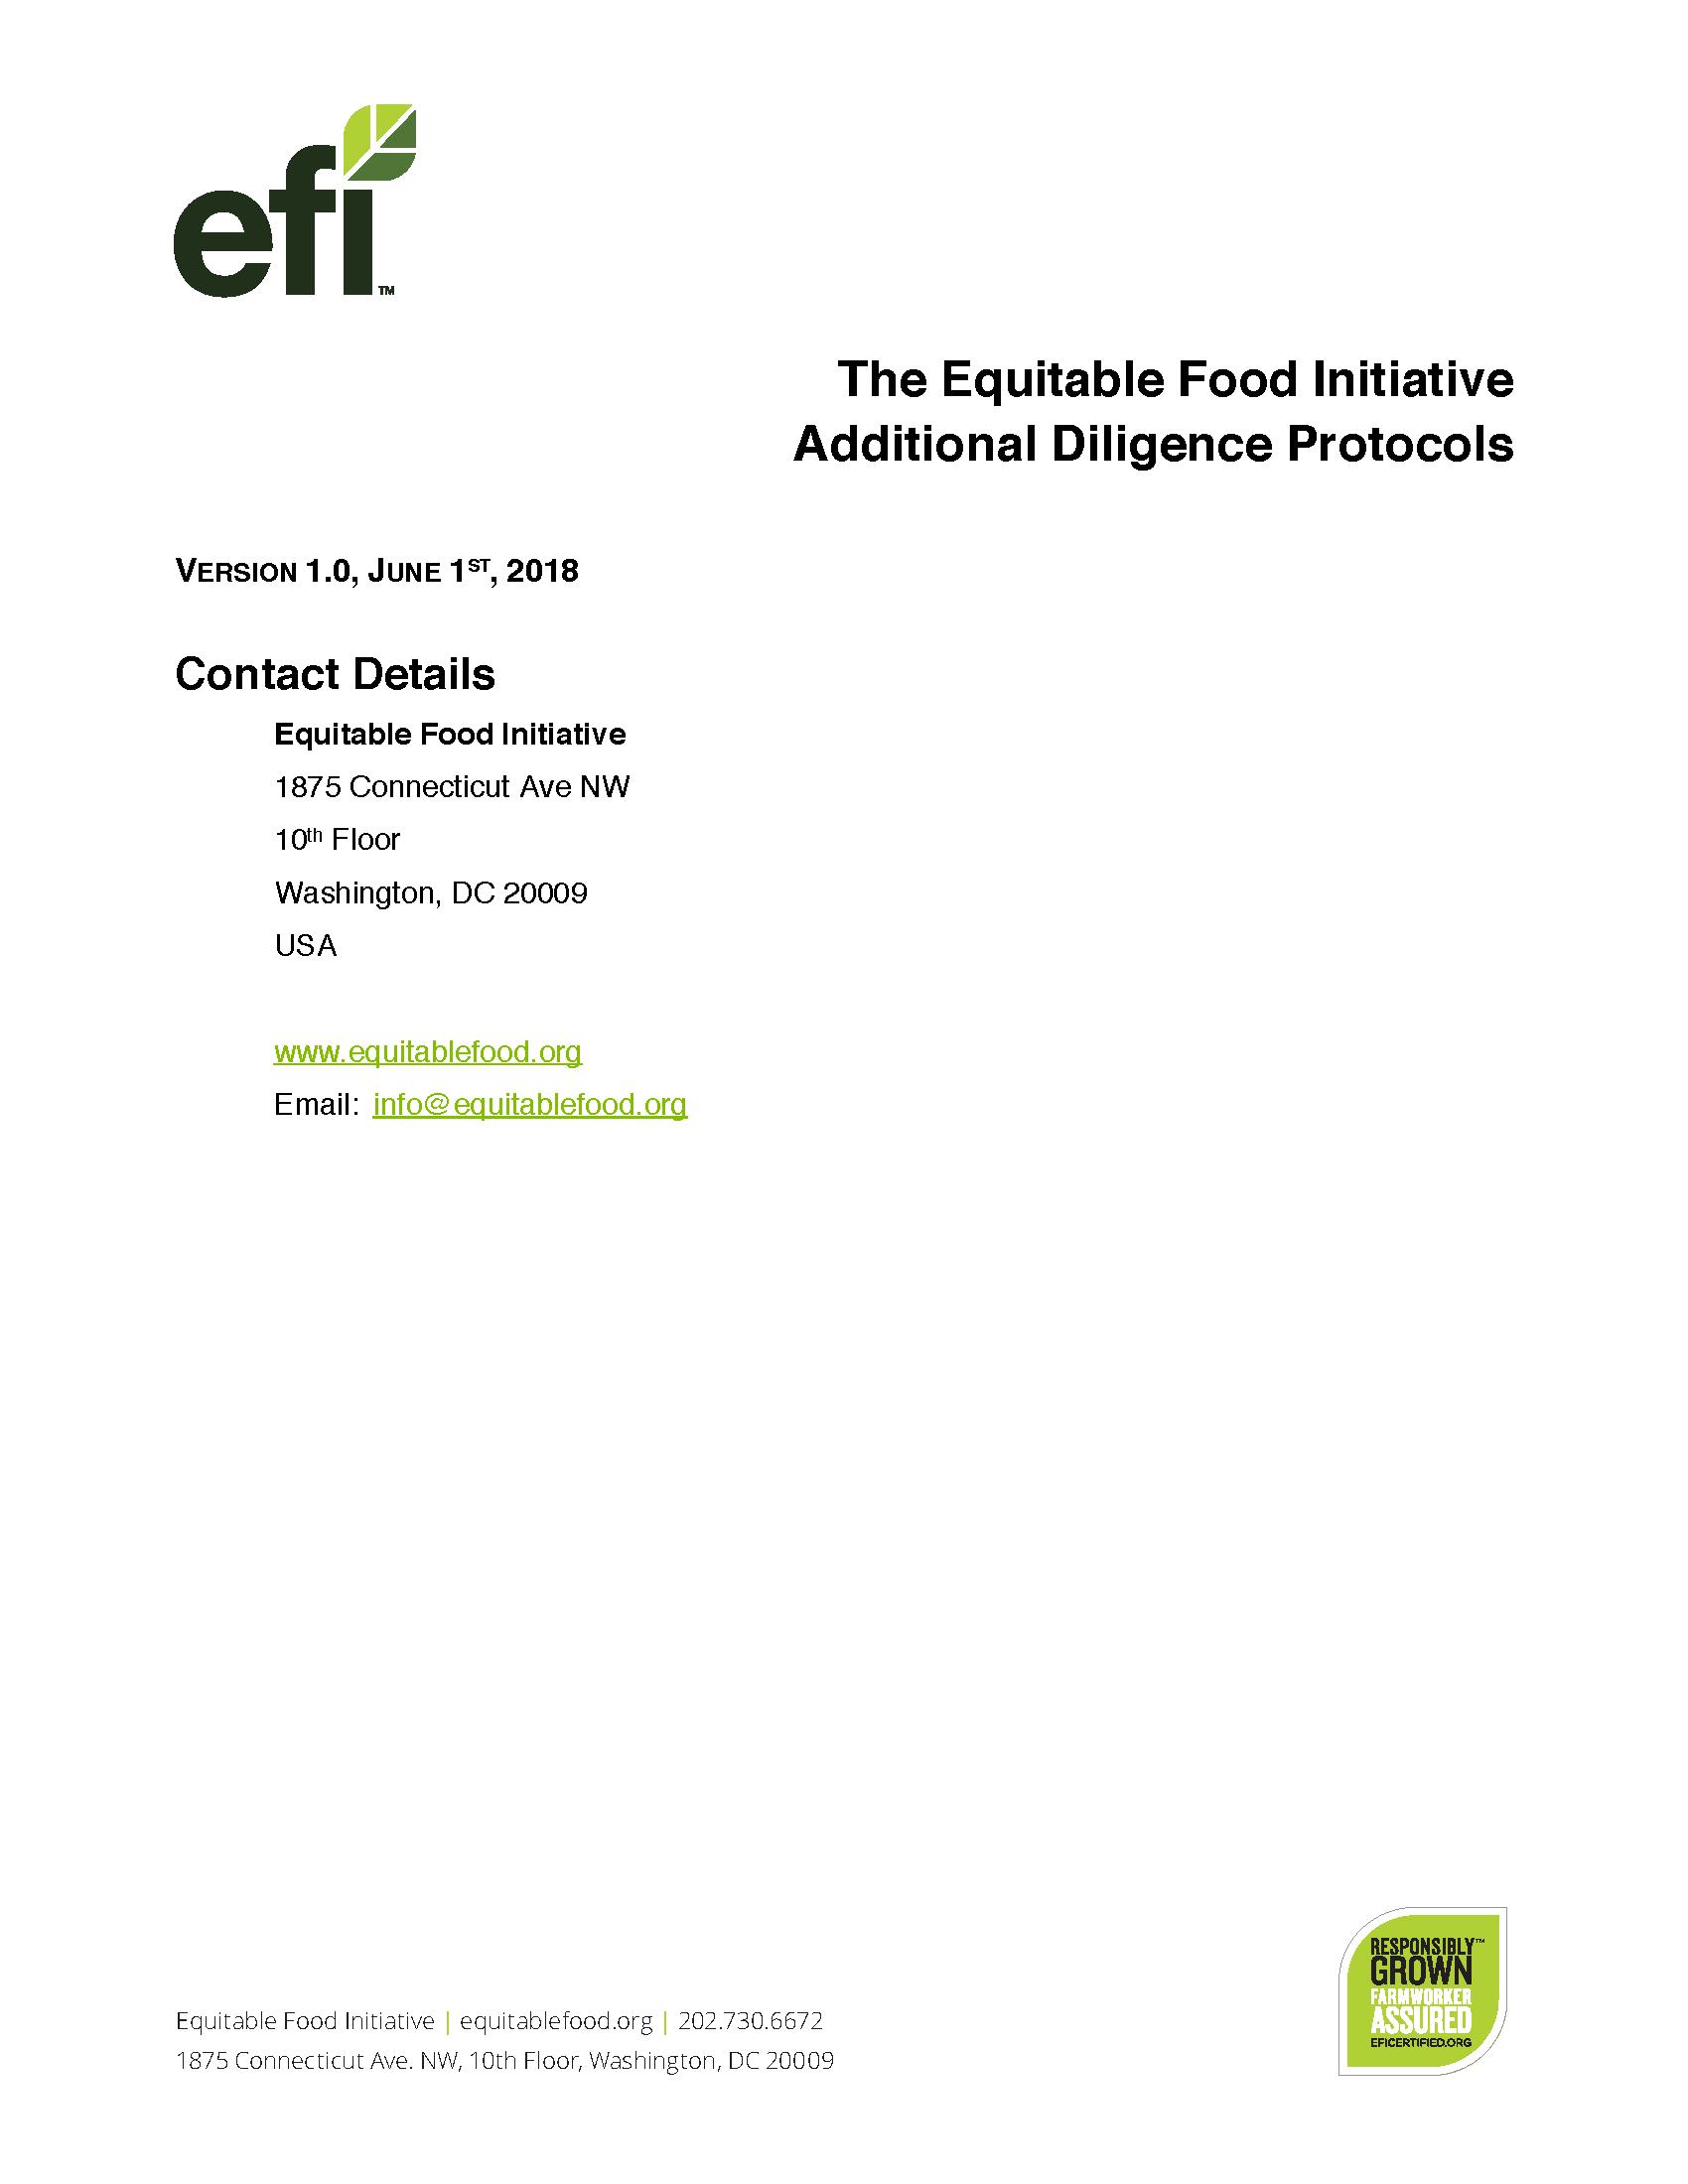 Efi Standards Equitable Food Initiative